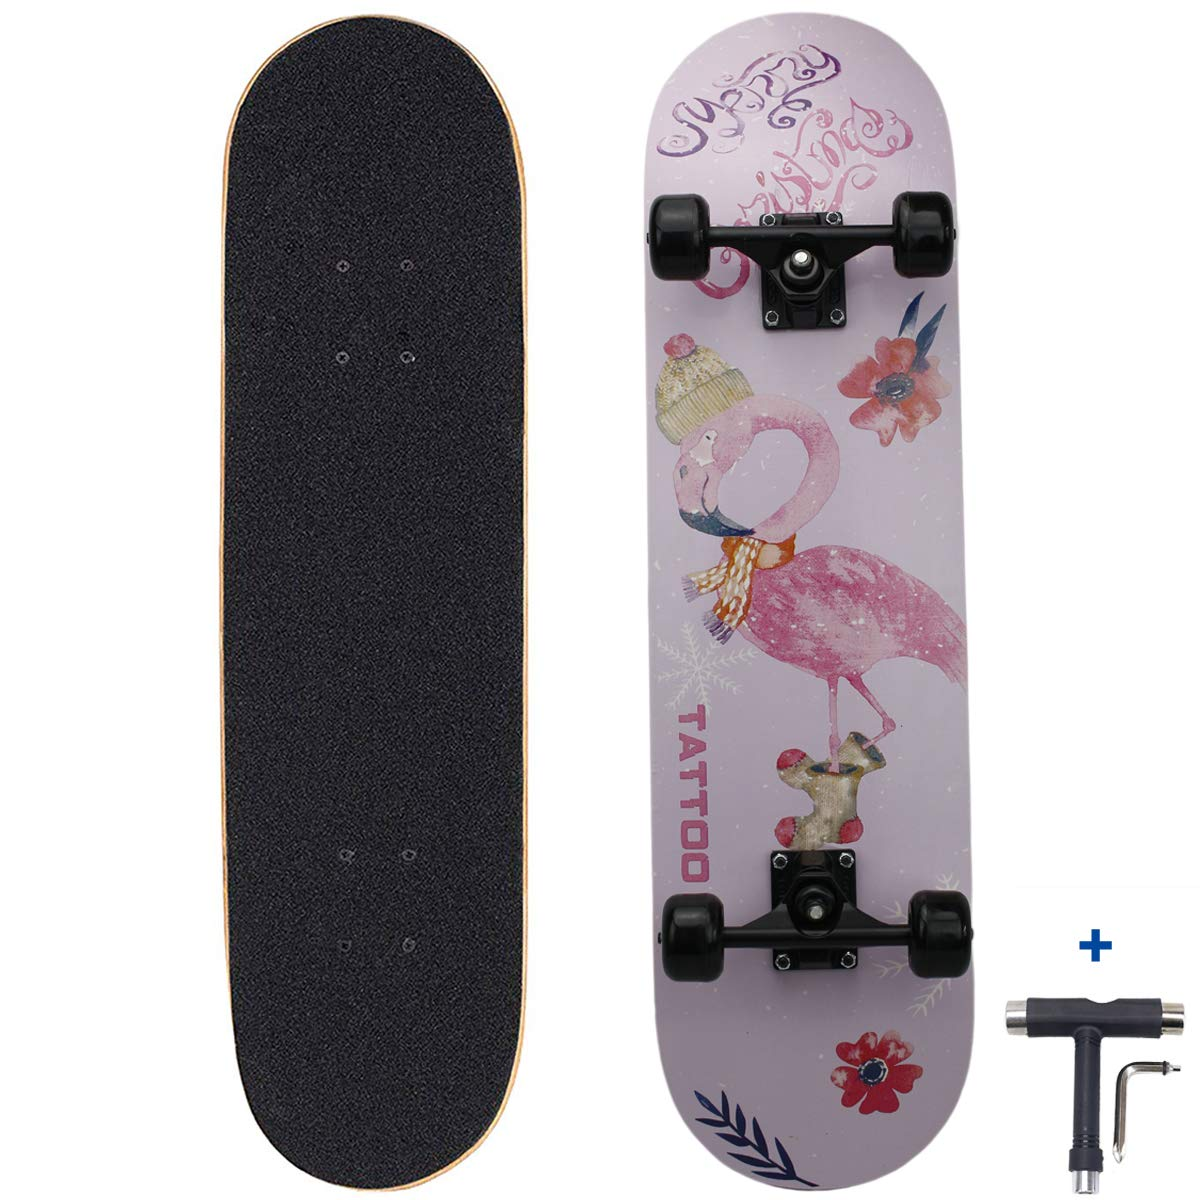 Dreambeauty 31 inch Pro Skateboard Complete,9 Layer Maple Wood Double Kick Concave Skateboards, Tricks Skateboards for Teens, Beginners, Girls, Boys, Kids, Adults (Flamingo)